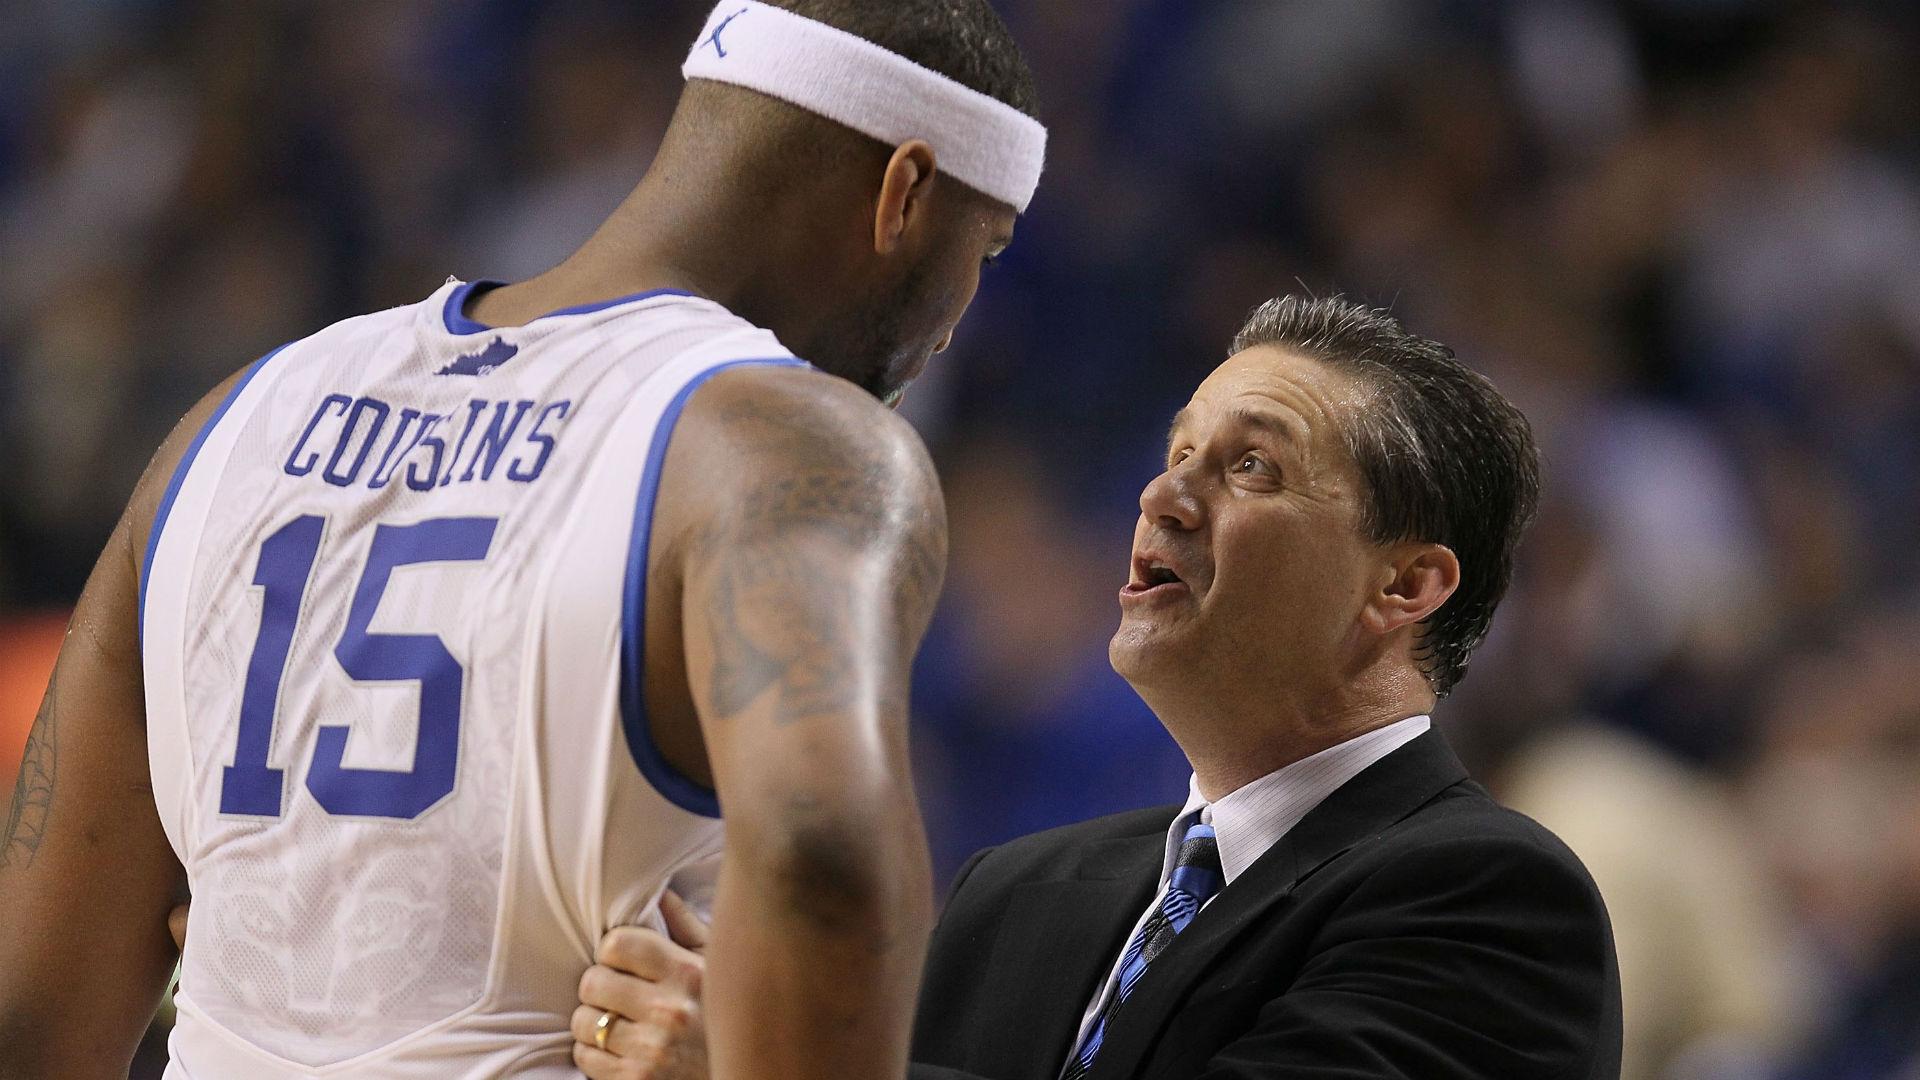 Kings have interest in John Calipari, Yahoo Sports reports